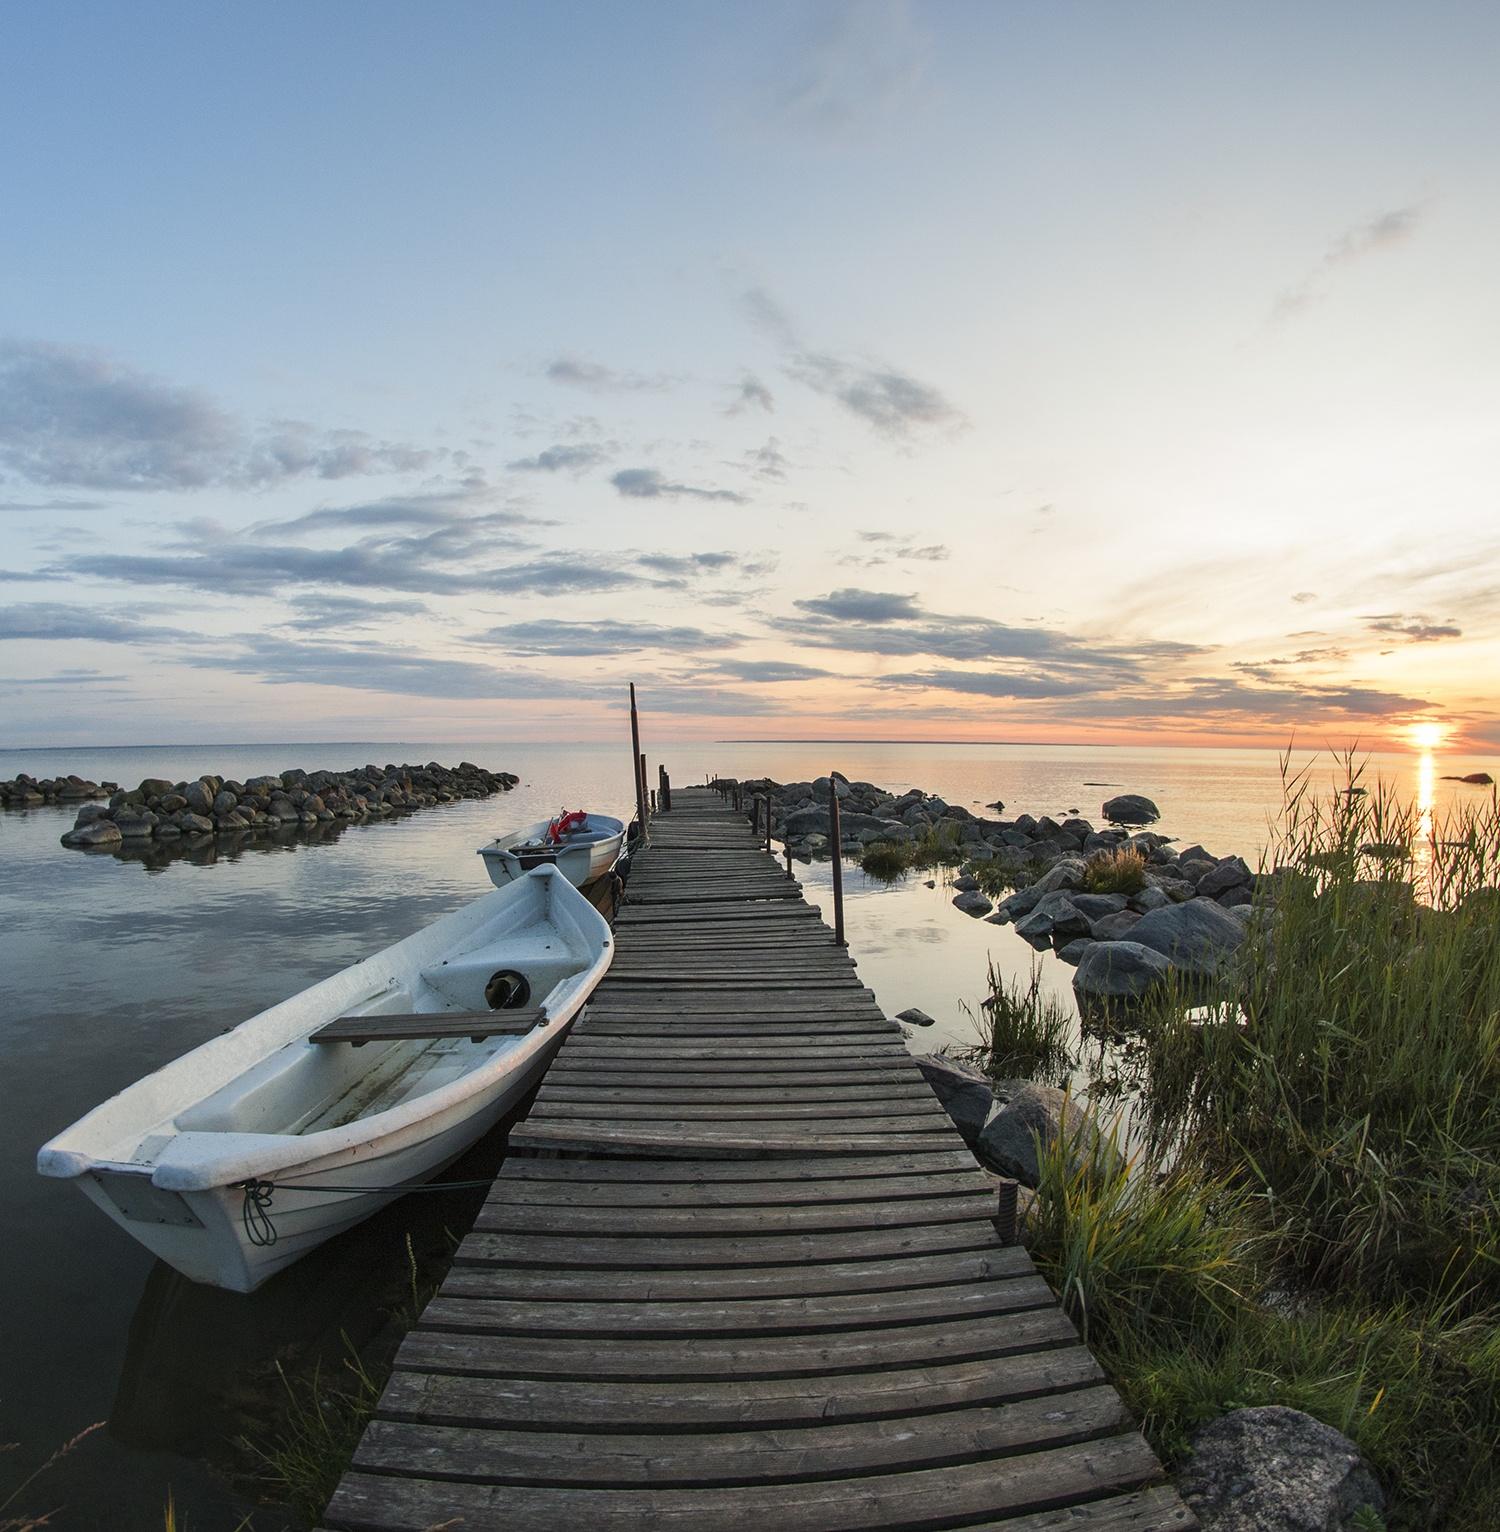 Boat, Baltic Sea and sunset in Viimsi, Estonia